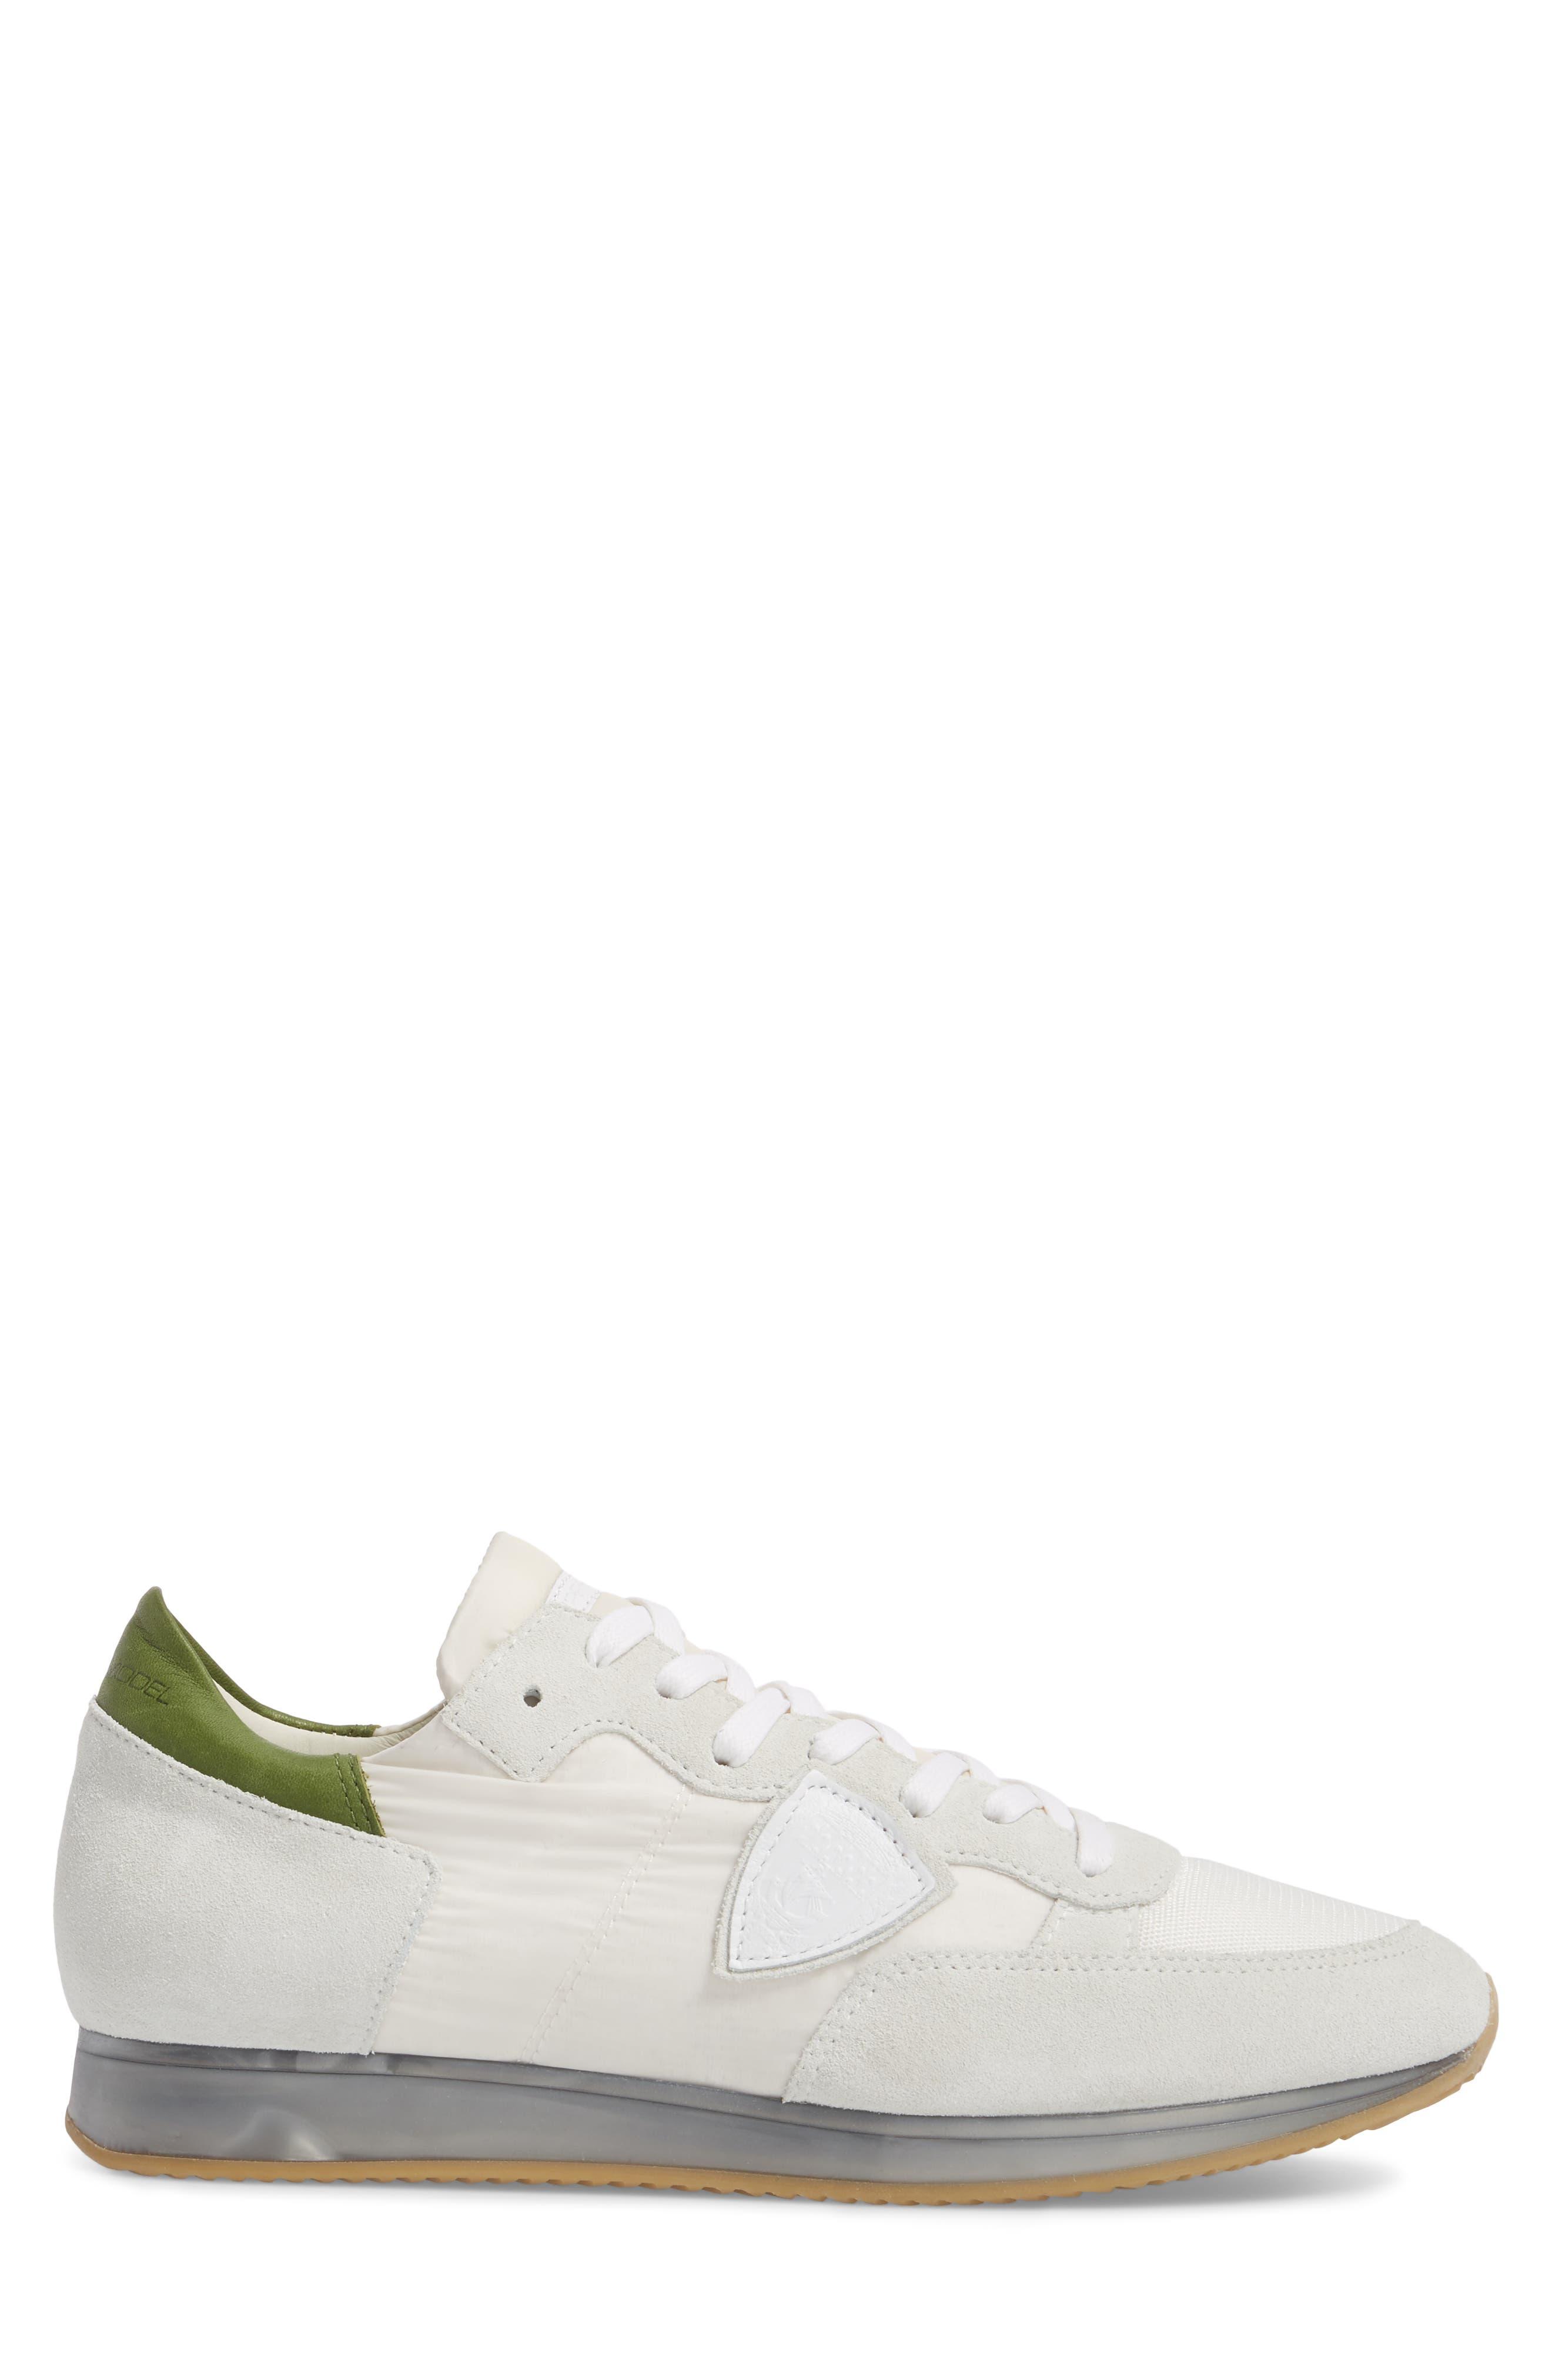 Tropez Sneaker,                             Alternate thumbnail 3, color,                             120